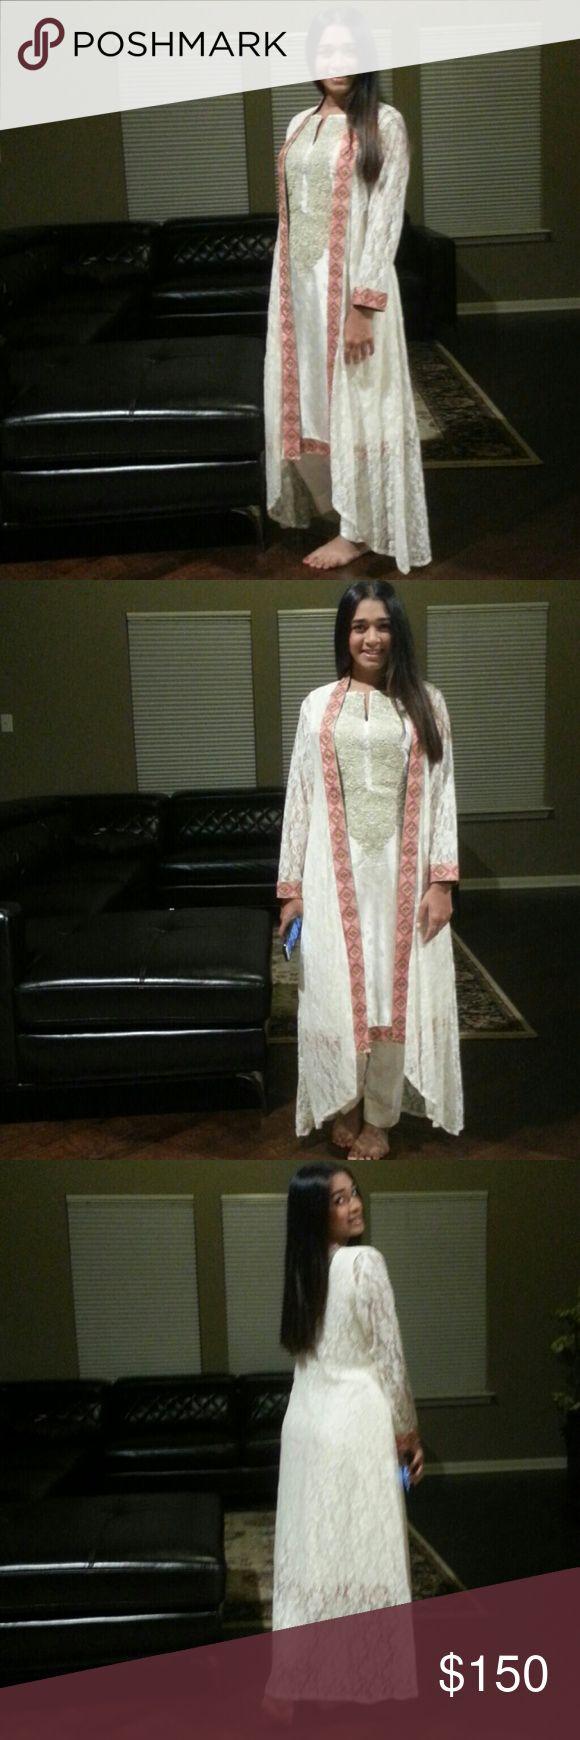 White salwar kurta New Dresses